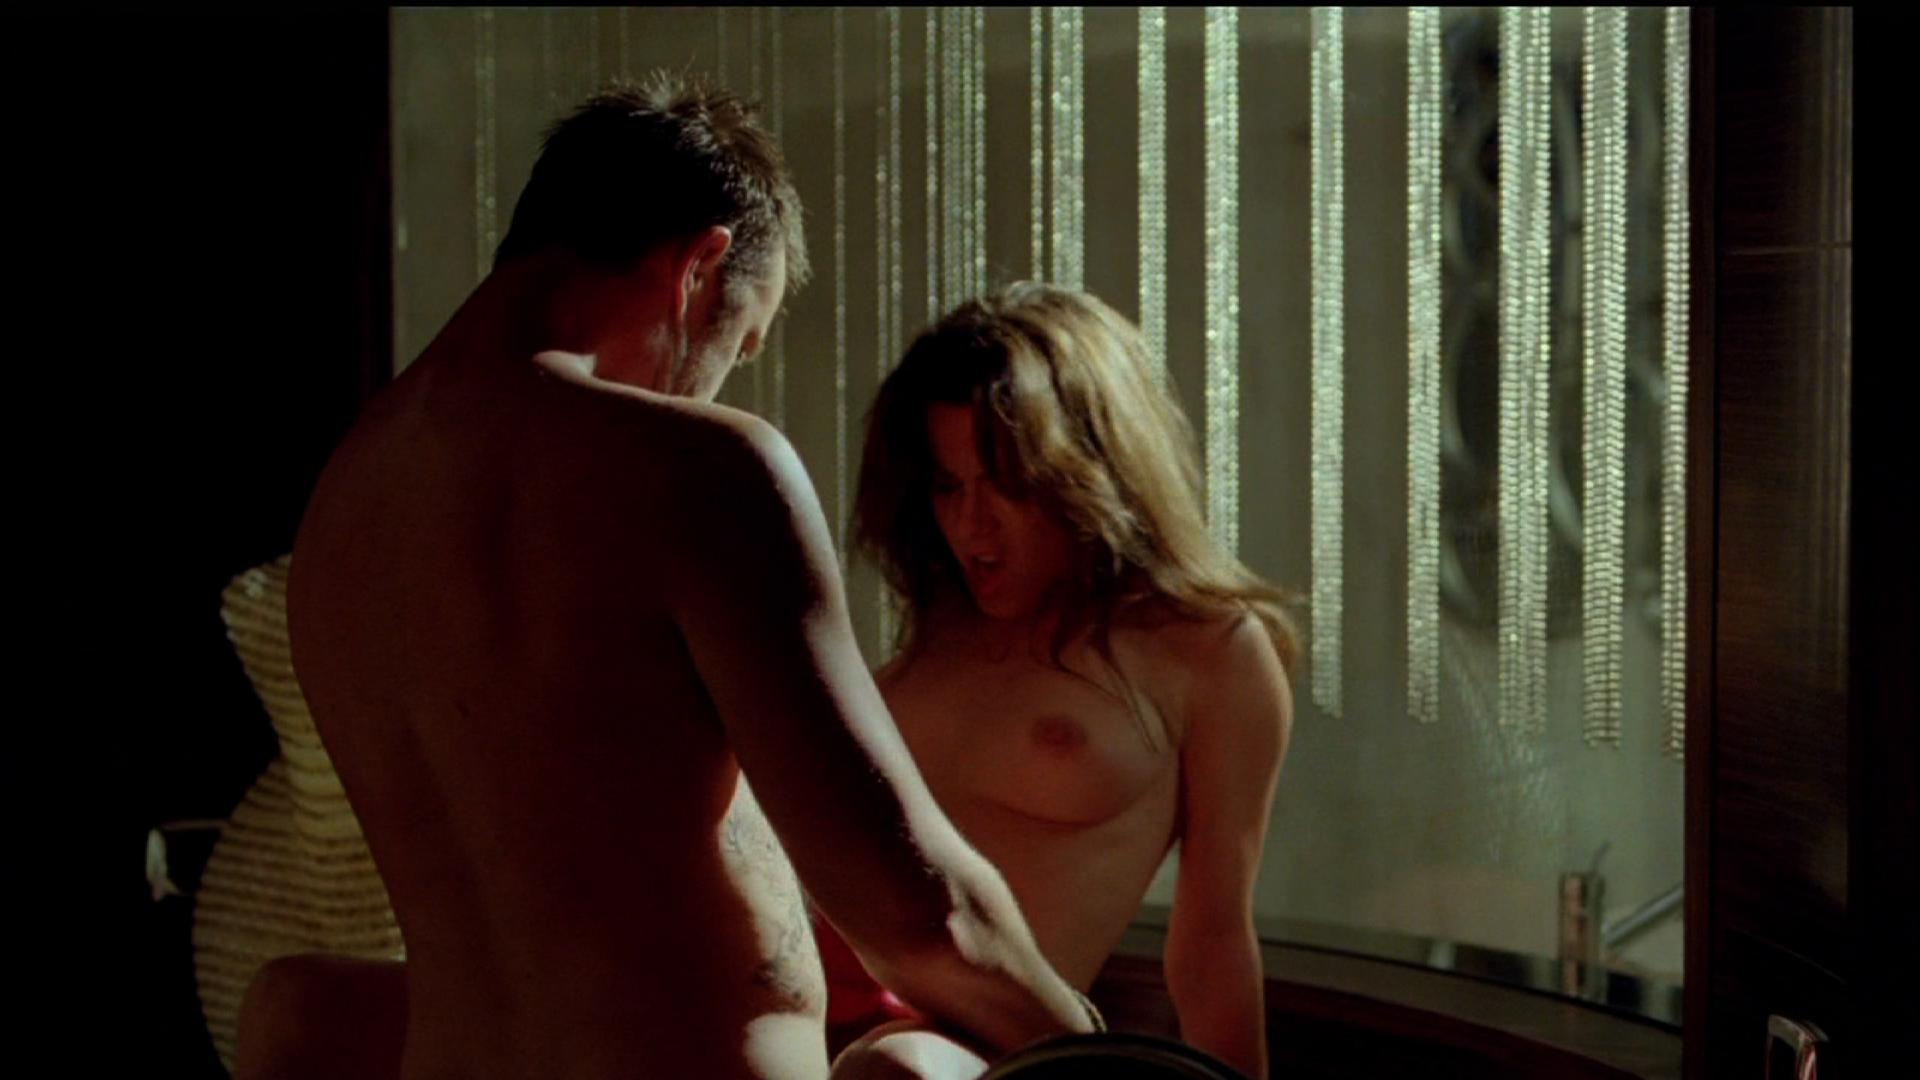 Natalia avelon nude pictures — pic 13